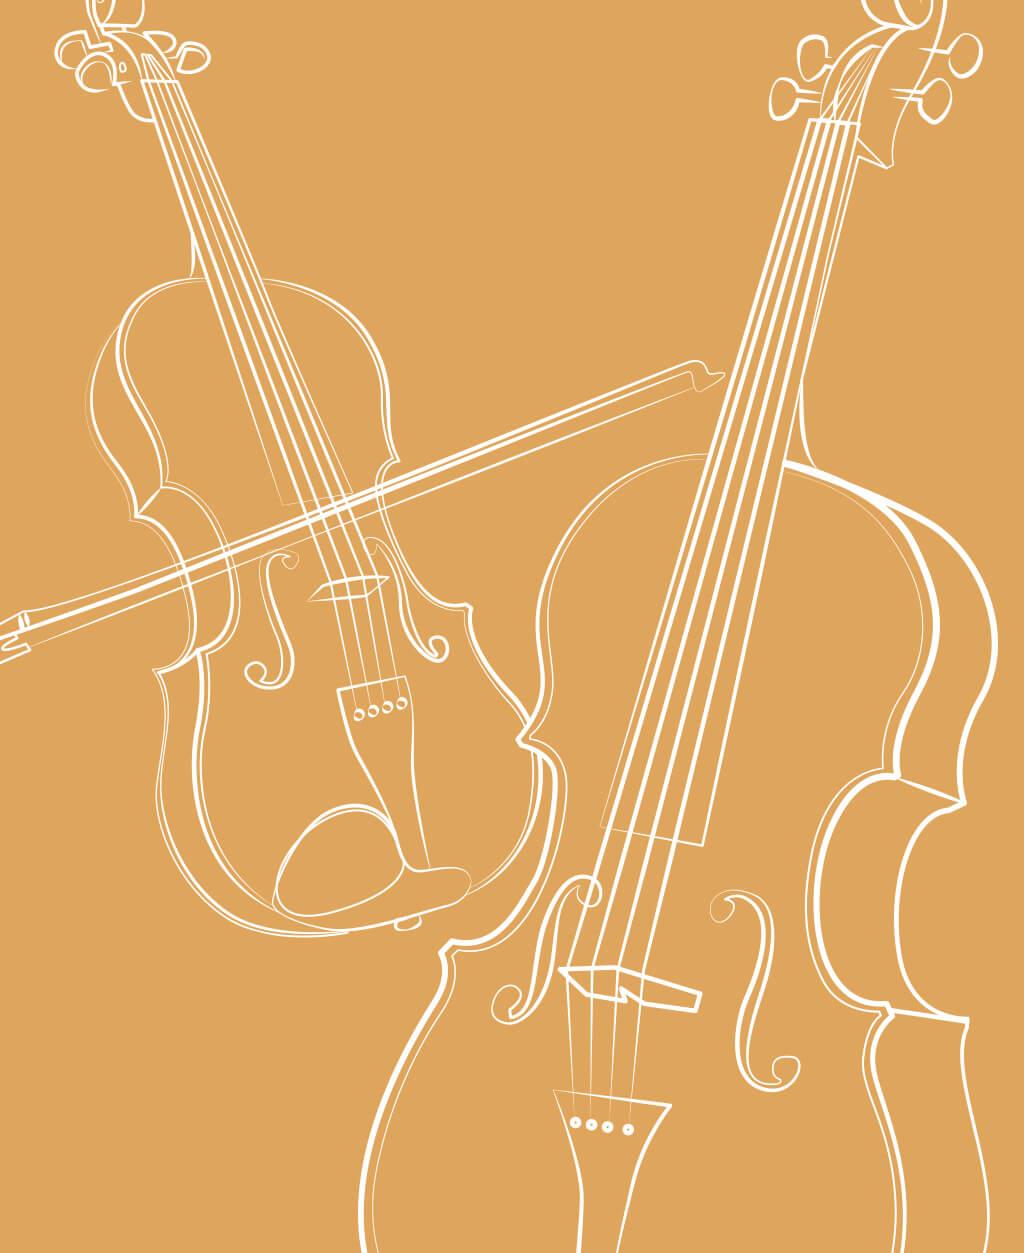 Shostakovich, Raff & Brahms